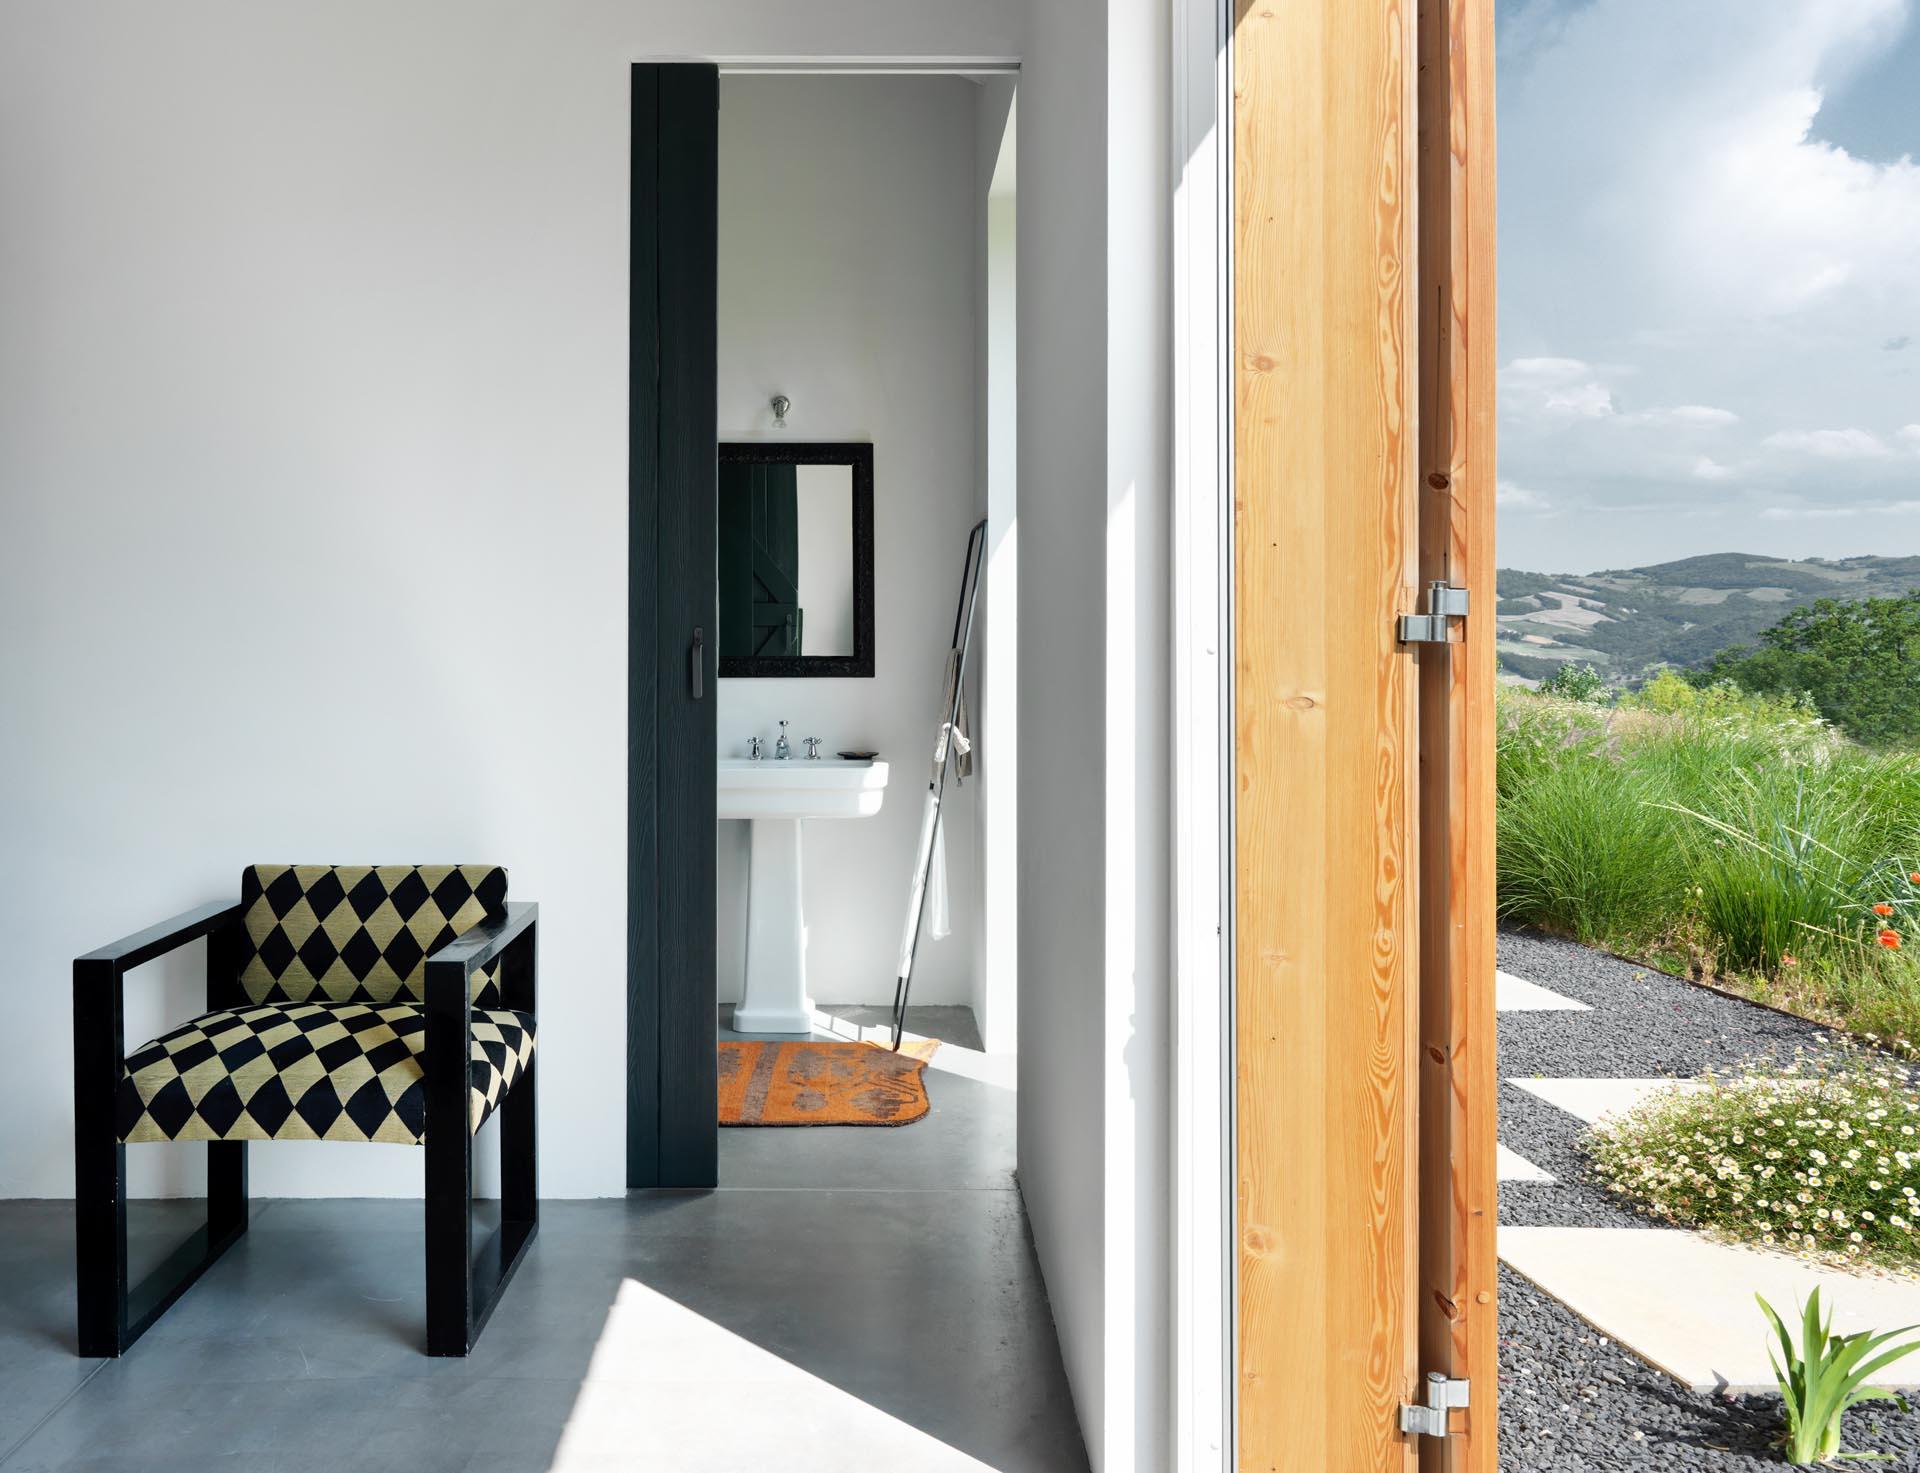 An ensuite bathroom with a black sliding door.